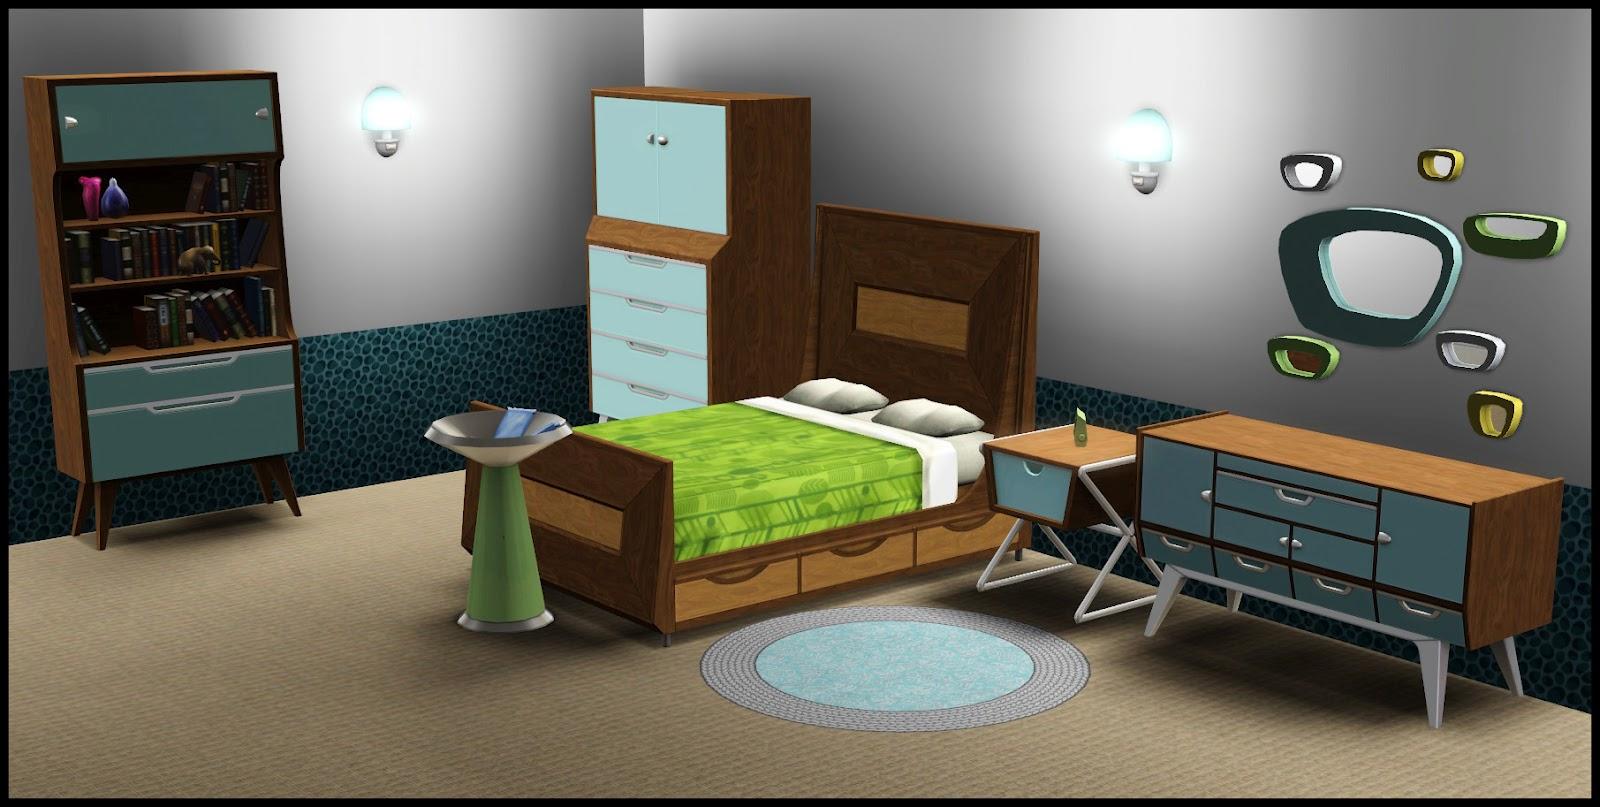 nightdove sims: store: a mid-century modern trailblazer set